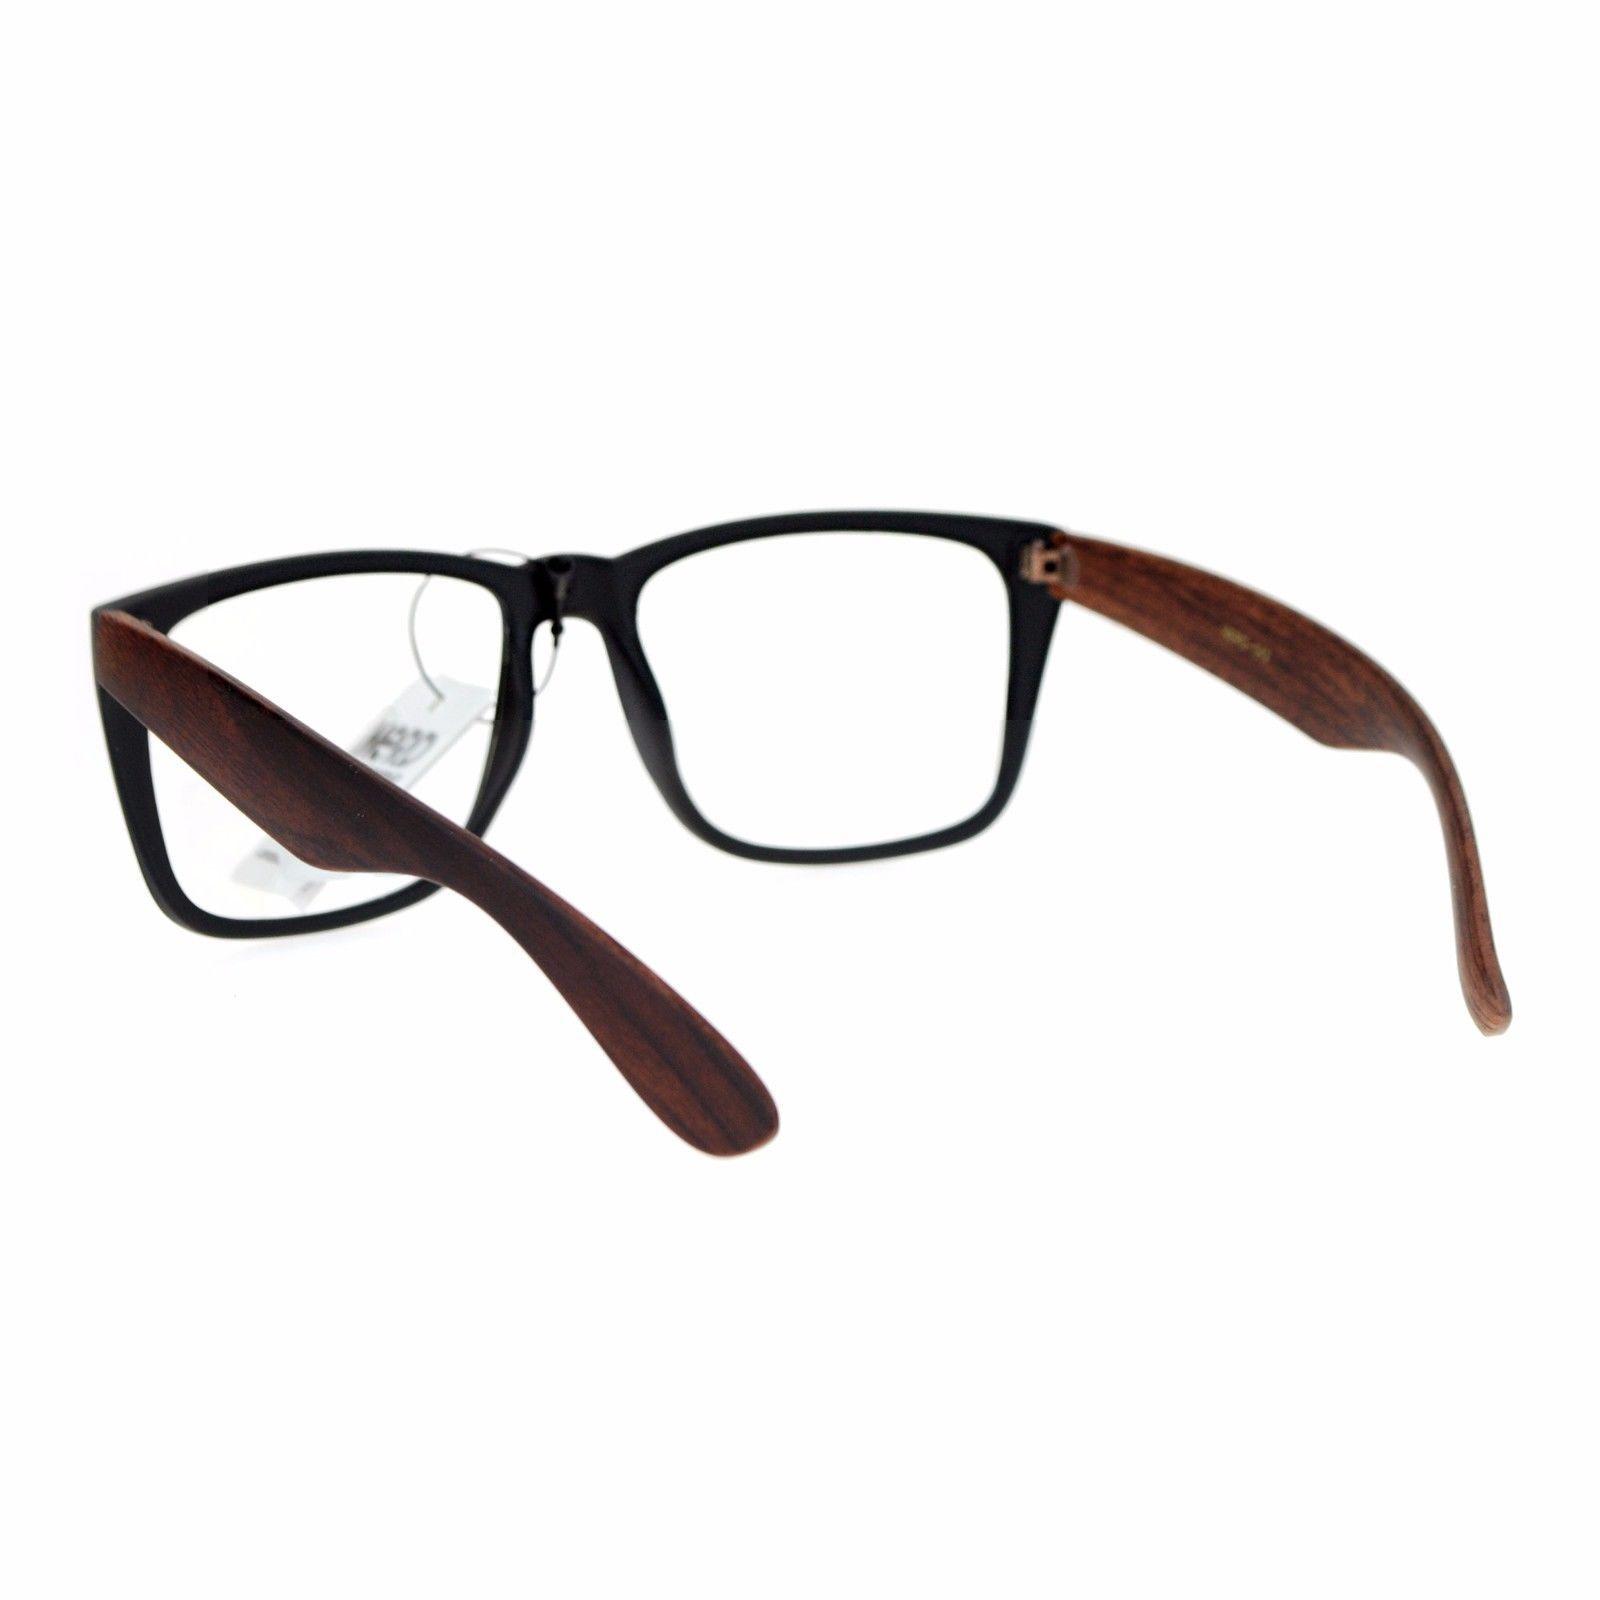 Clear Lens Glasses Square Soft Matted Wood Print Unisex Eyeglasses UV 400